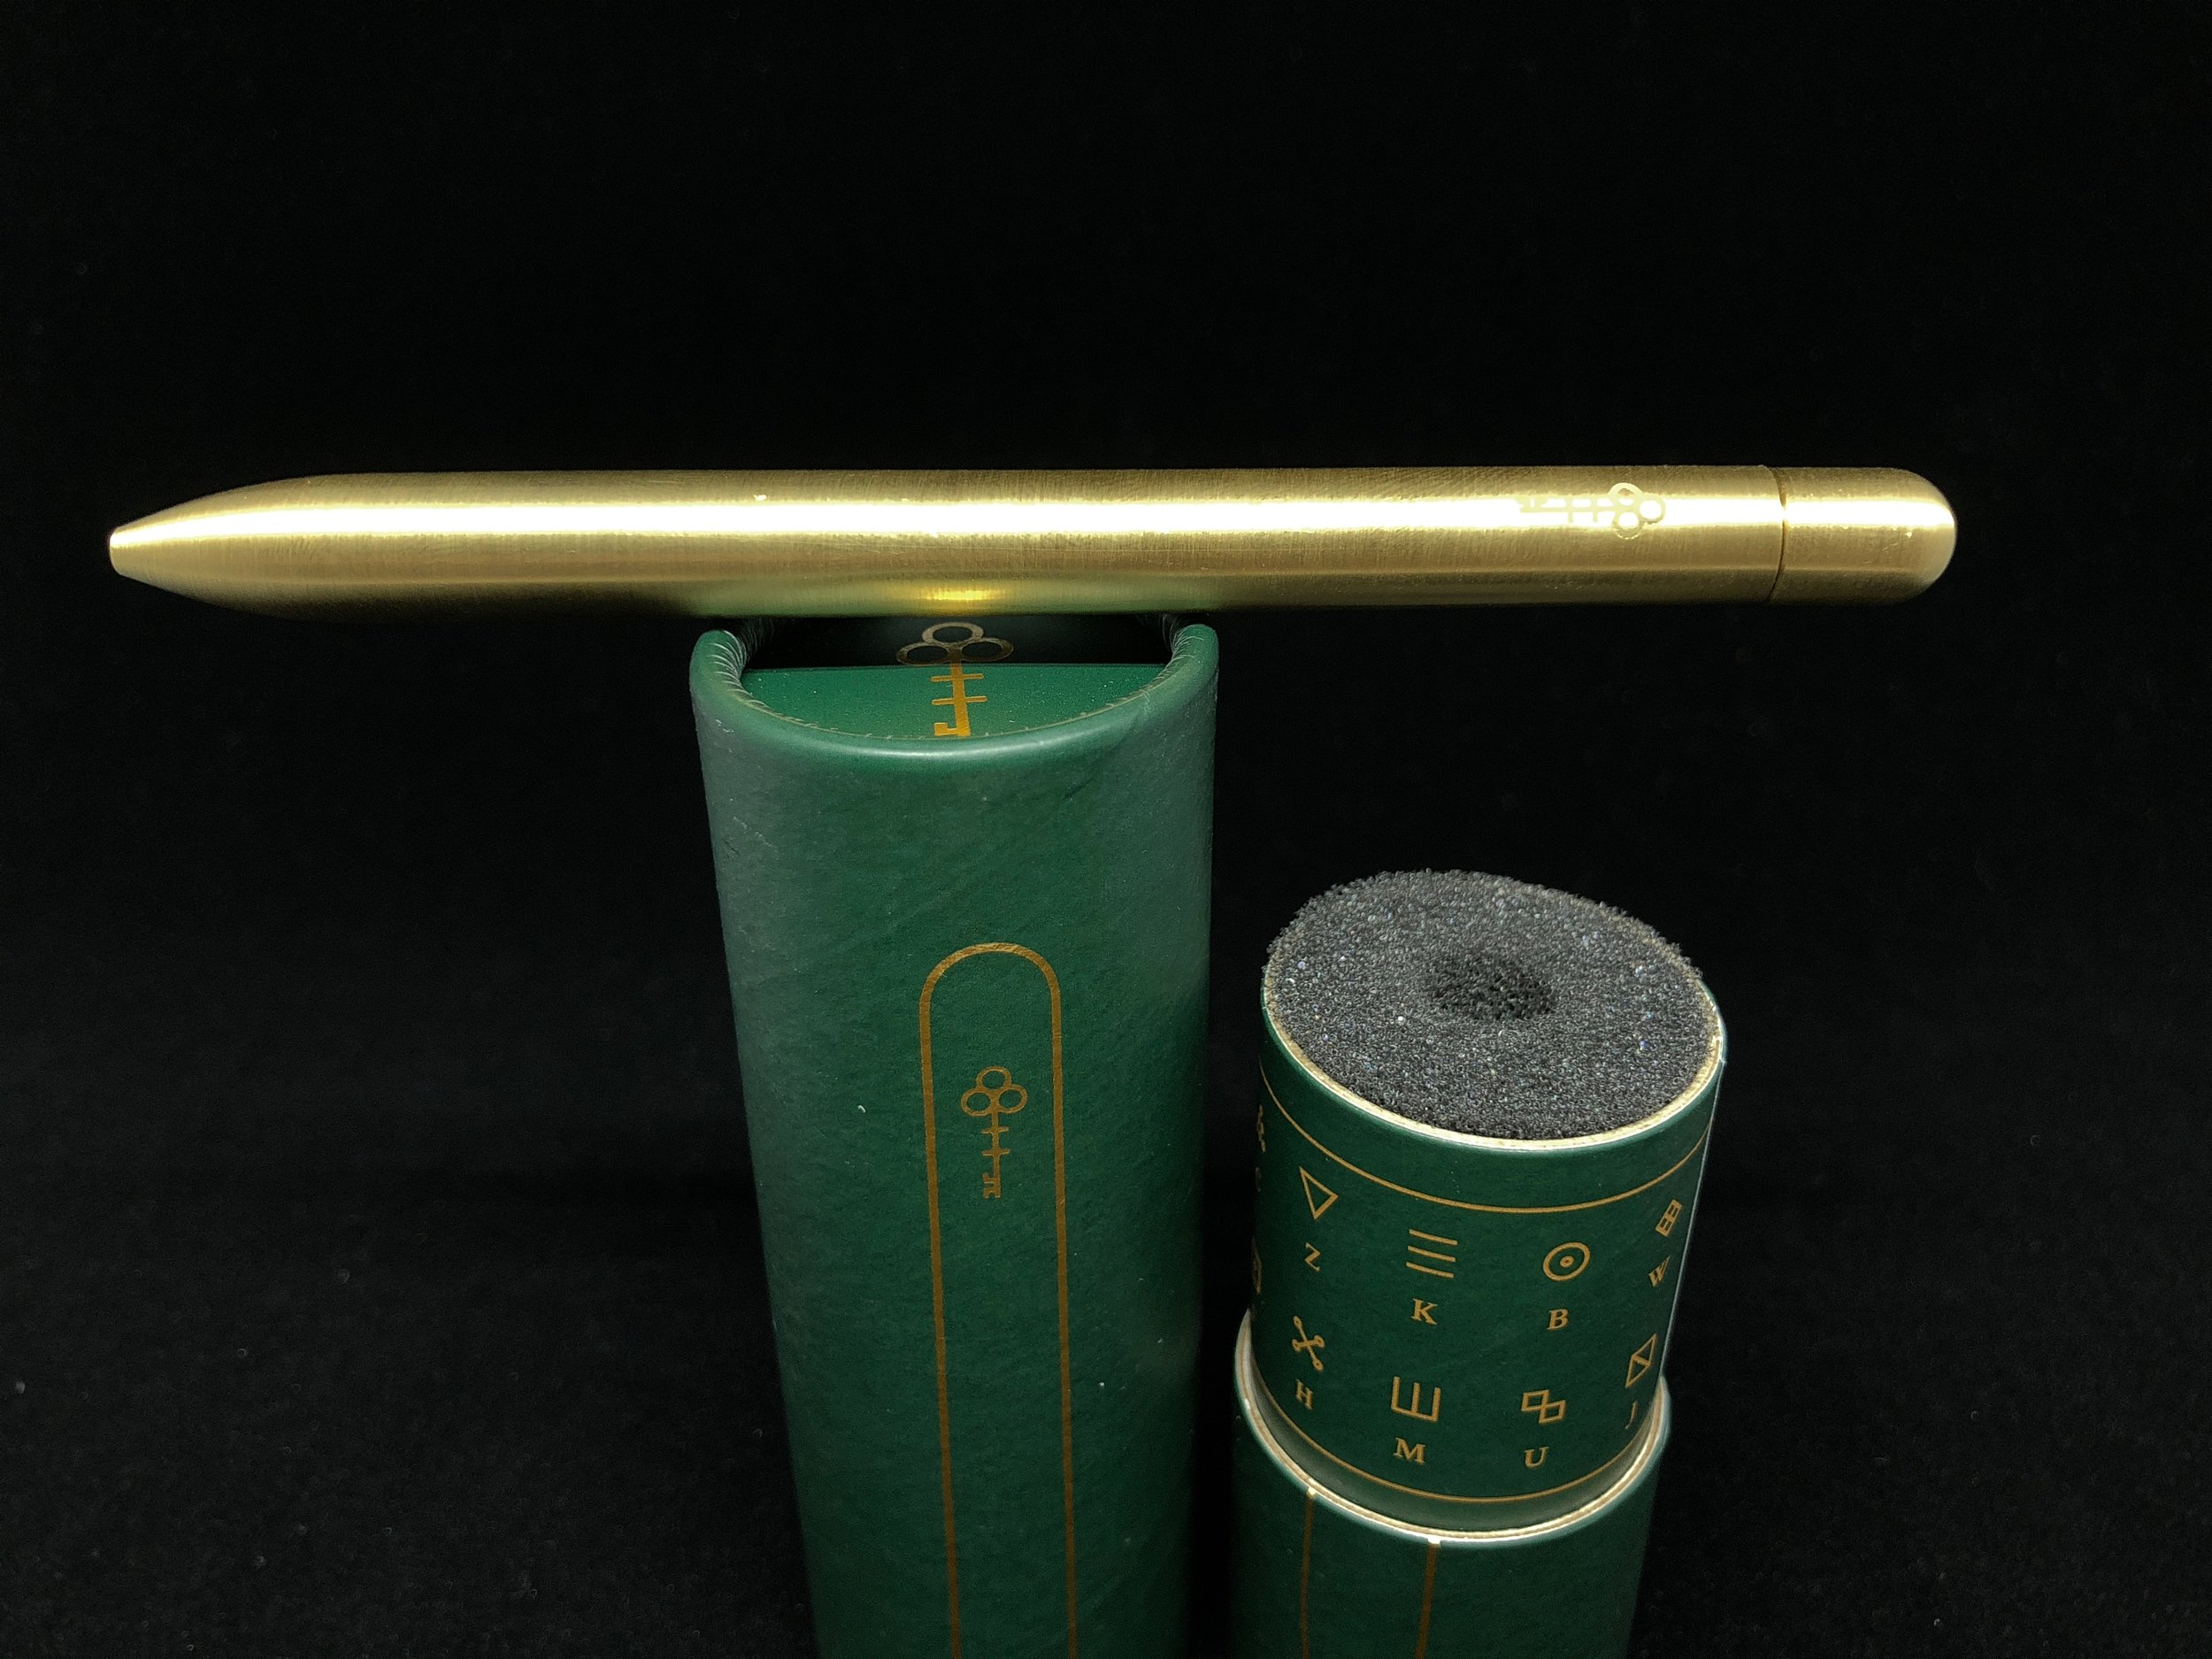 baron-fig-squire-pen-key-brass-6.jpg